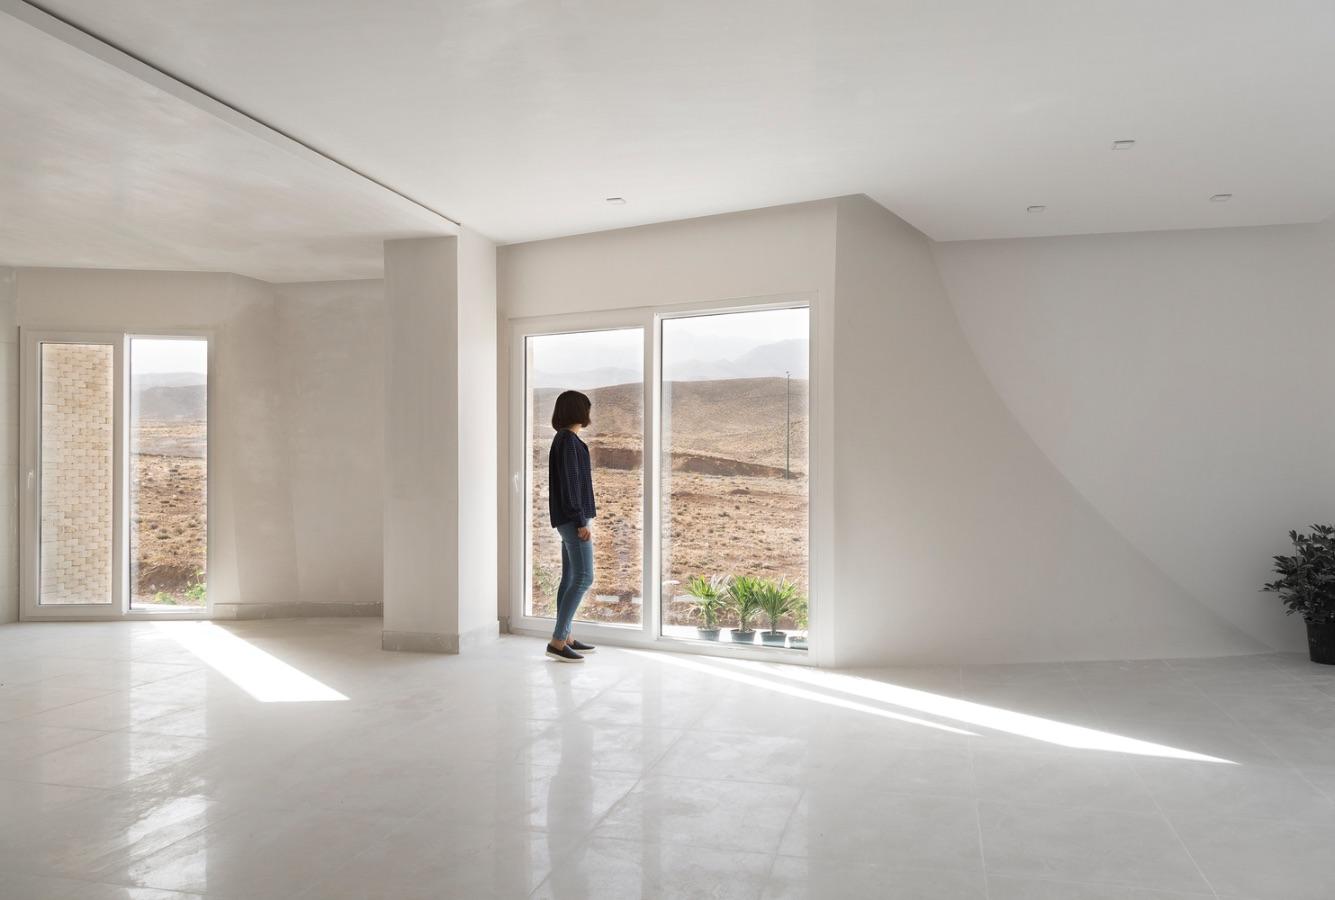 3_Mahallat Residential Building No3_CAAT Studio_Inspirationist